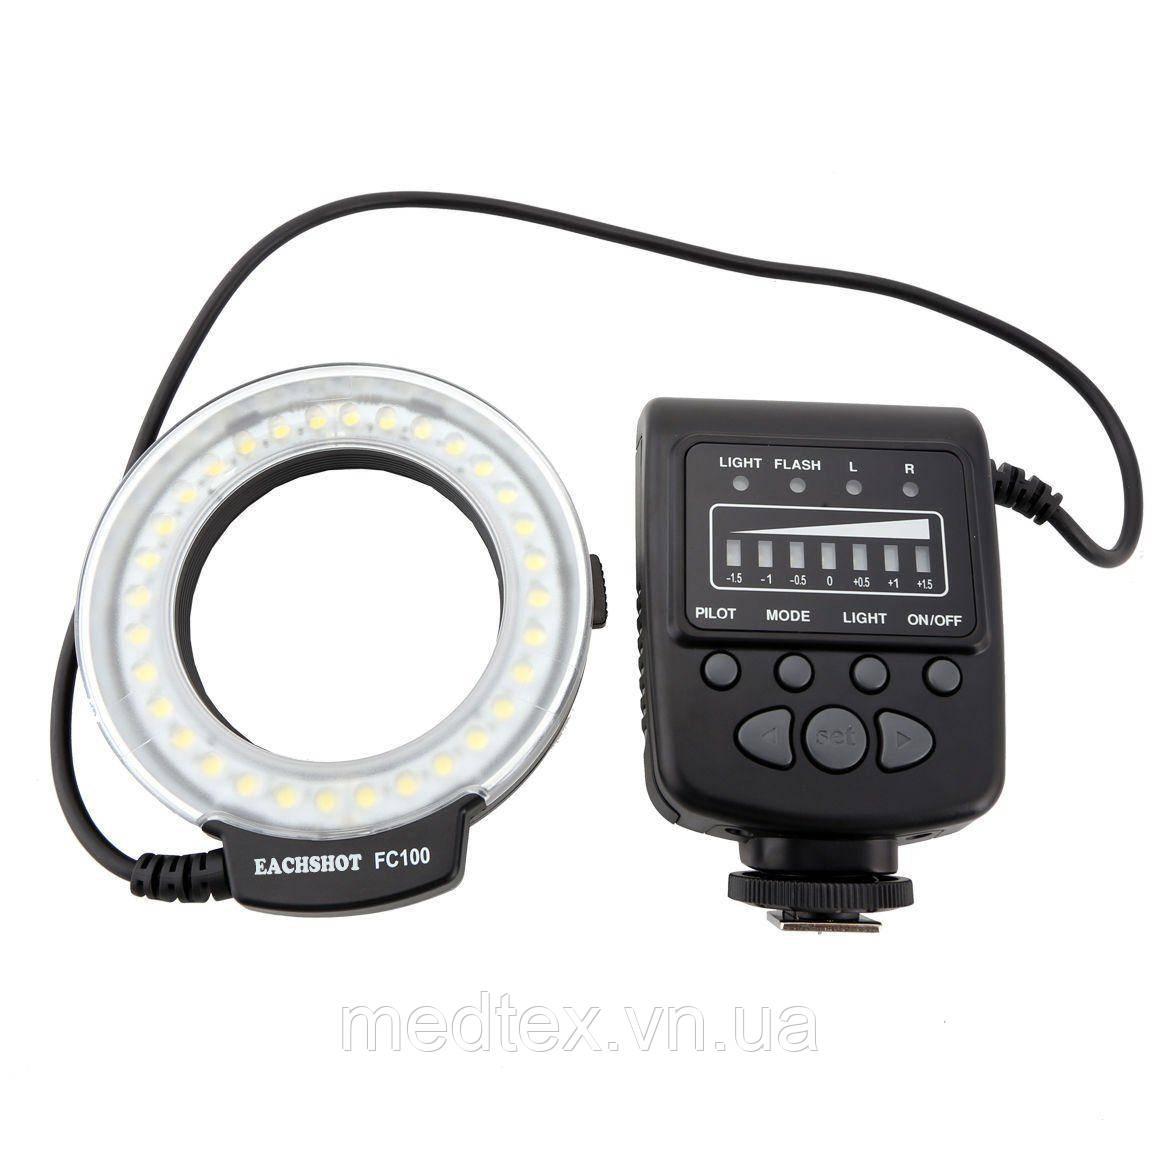 Кольцевая LED макровспышка MeiKe FC-100